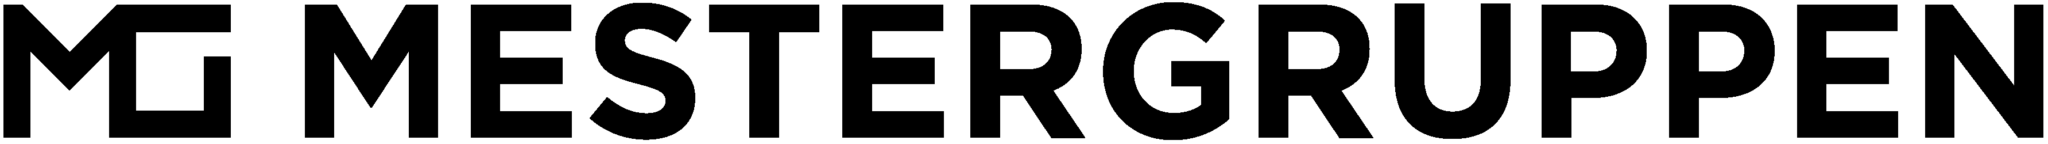 Mestergruppen